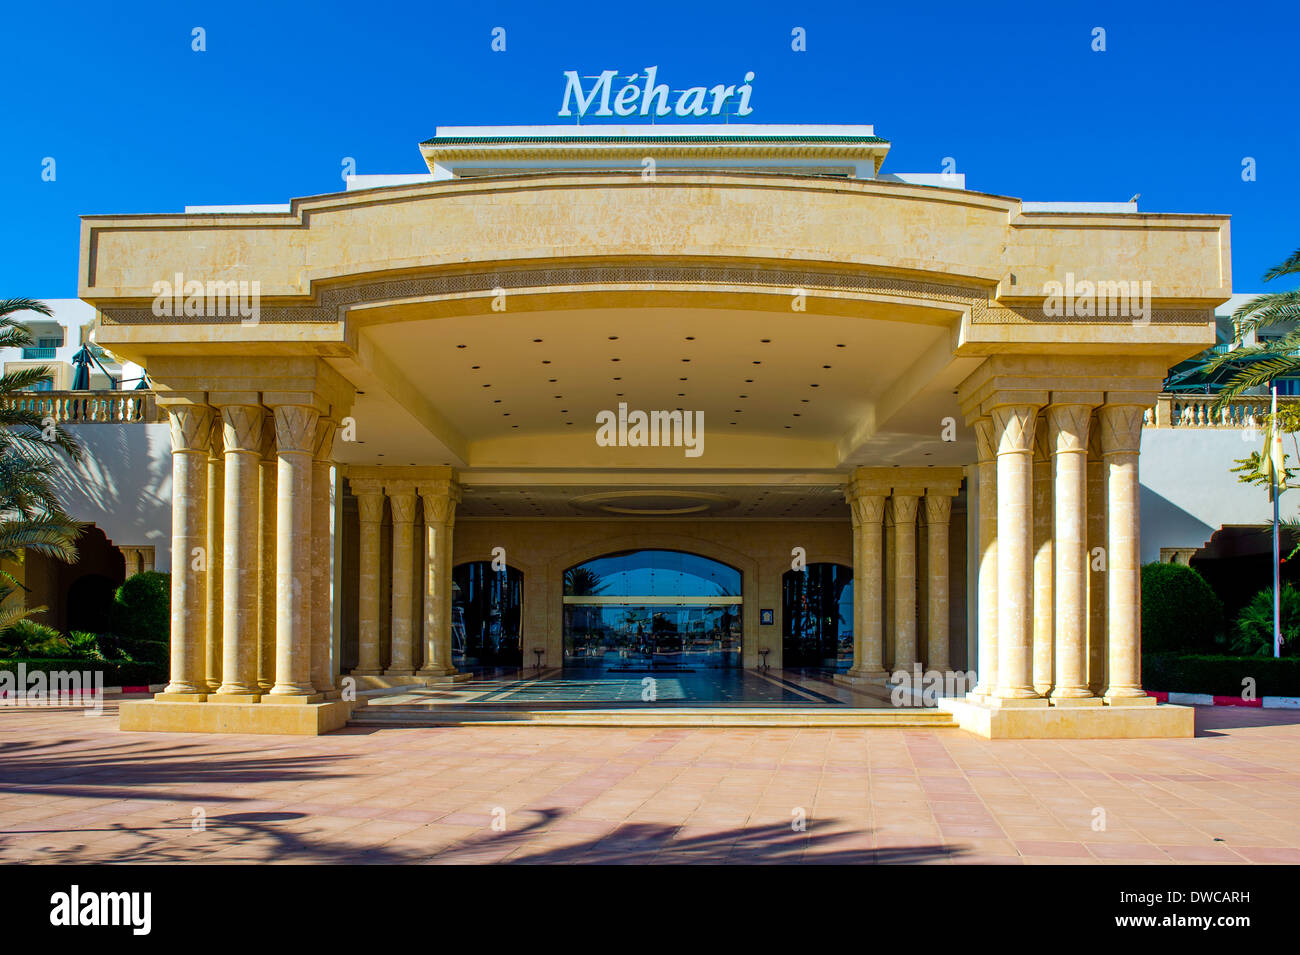 North Africa, Tunisia, Cape Bon, Hammamet. The Méhari luxury hotel. - Stock Image